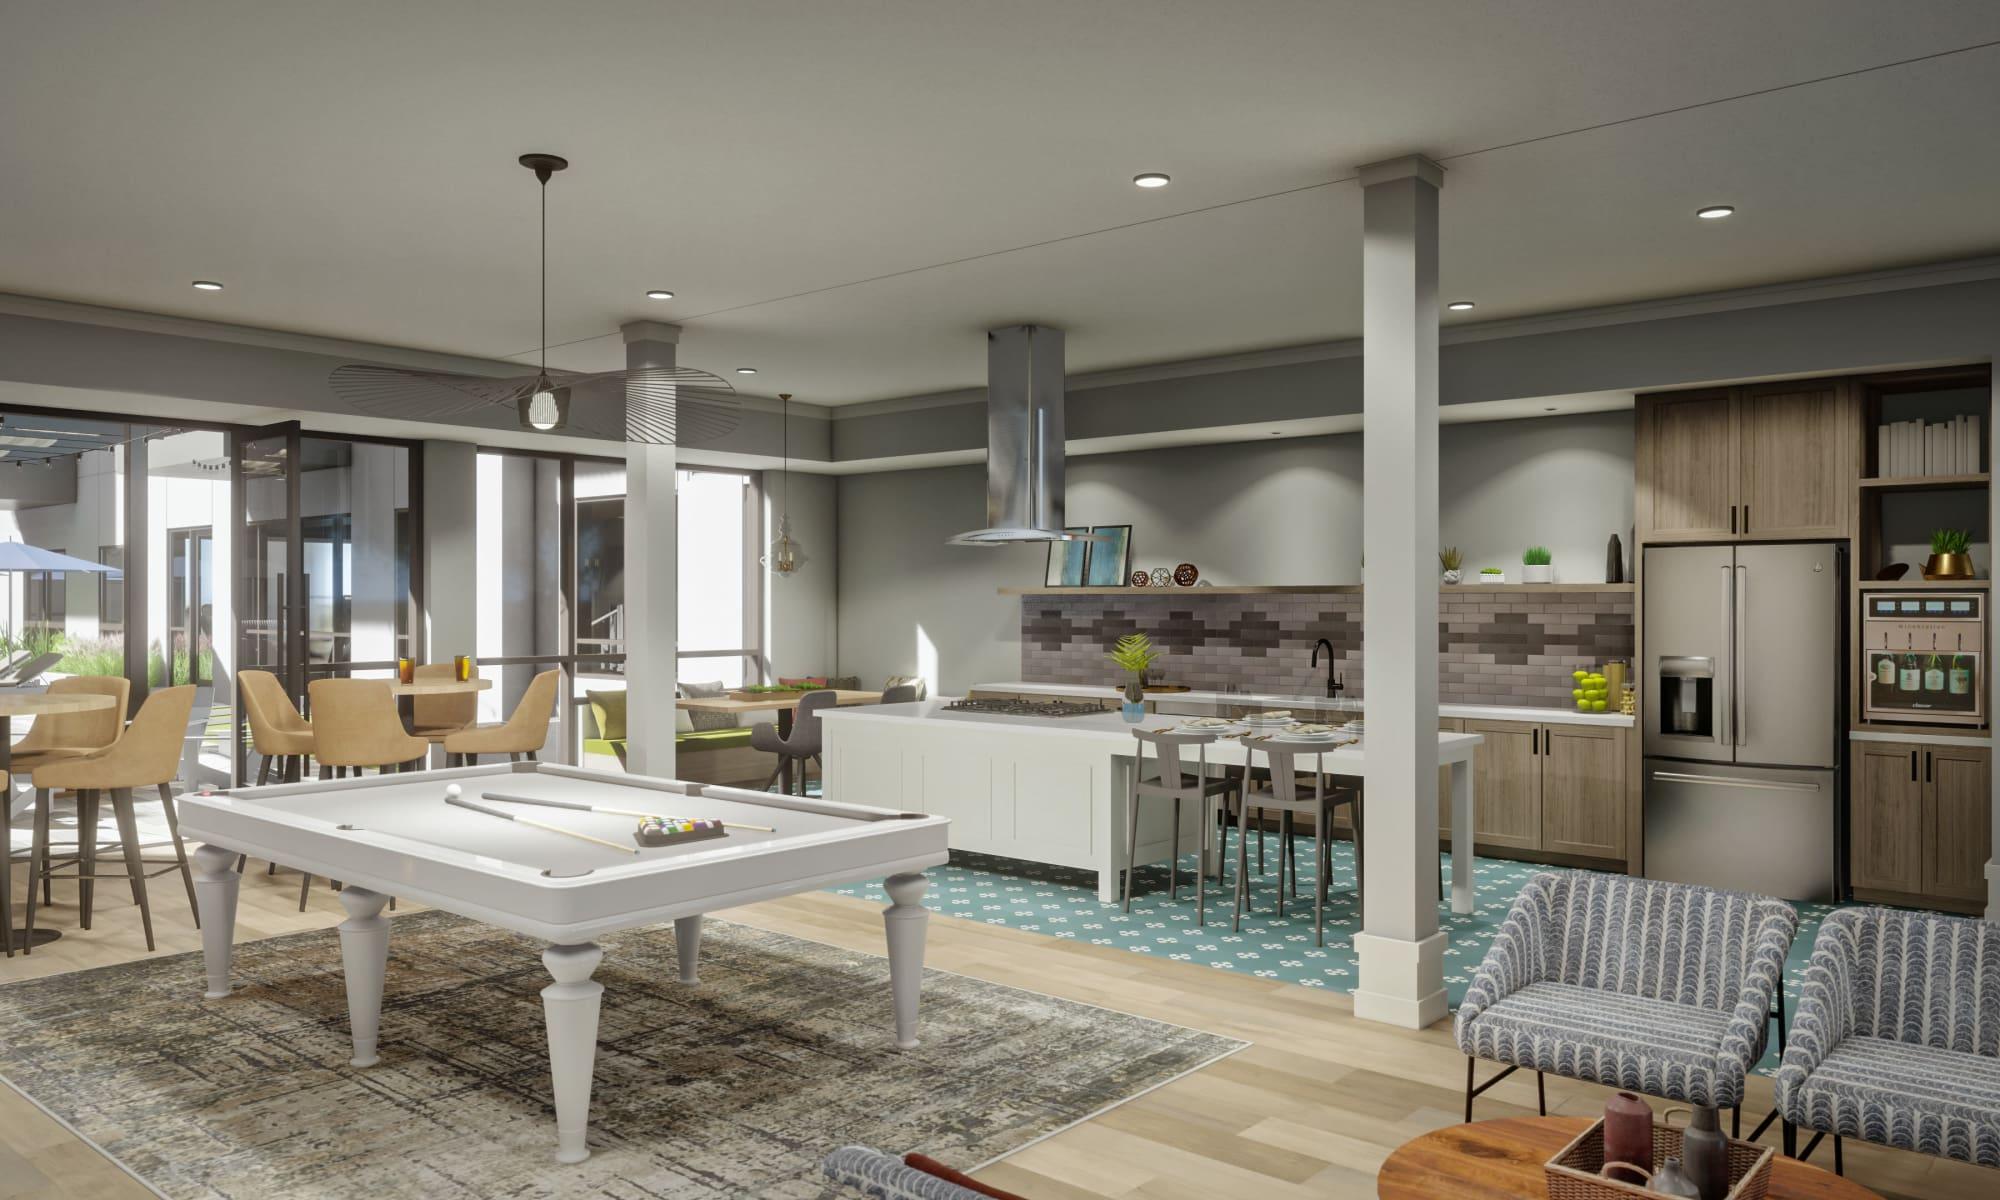 Apartments in Phoenix, Arizona, at The Astor at Osborn